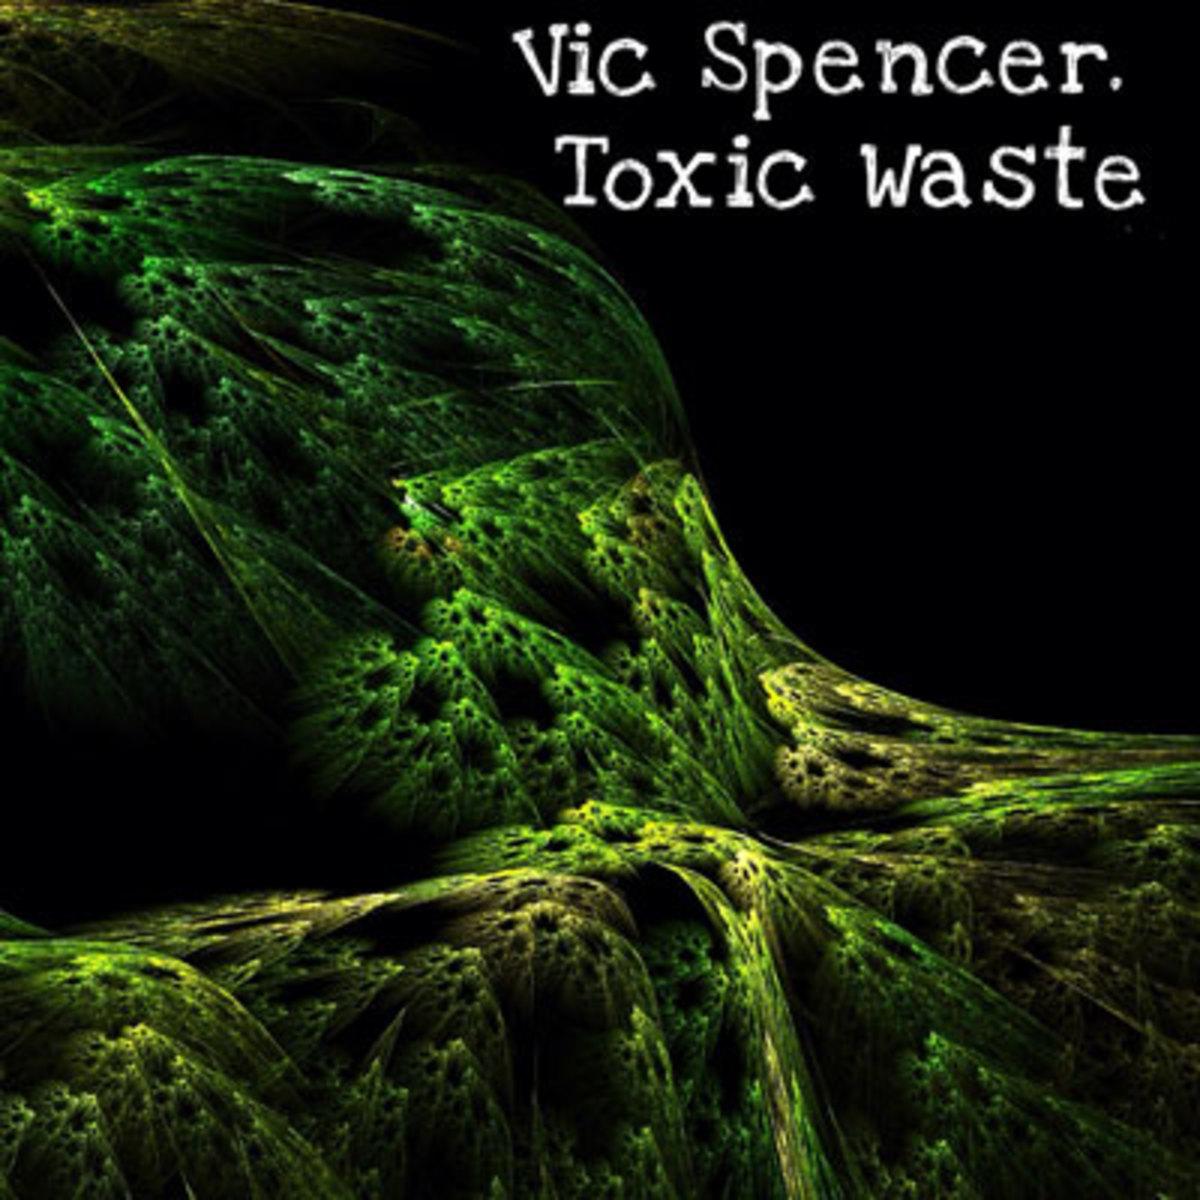 vicspencer-toxicwaste.jpg